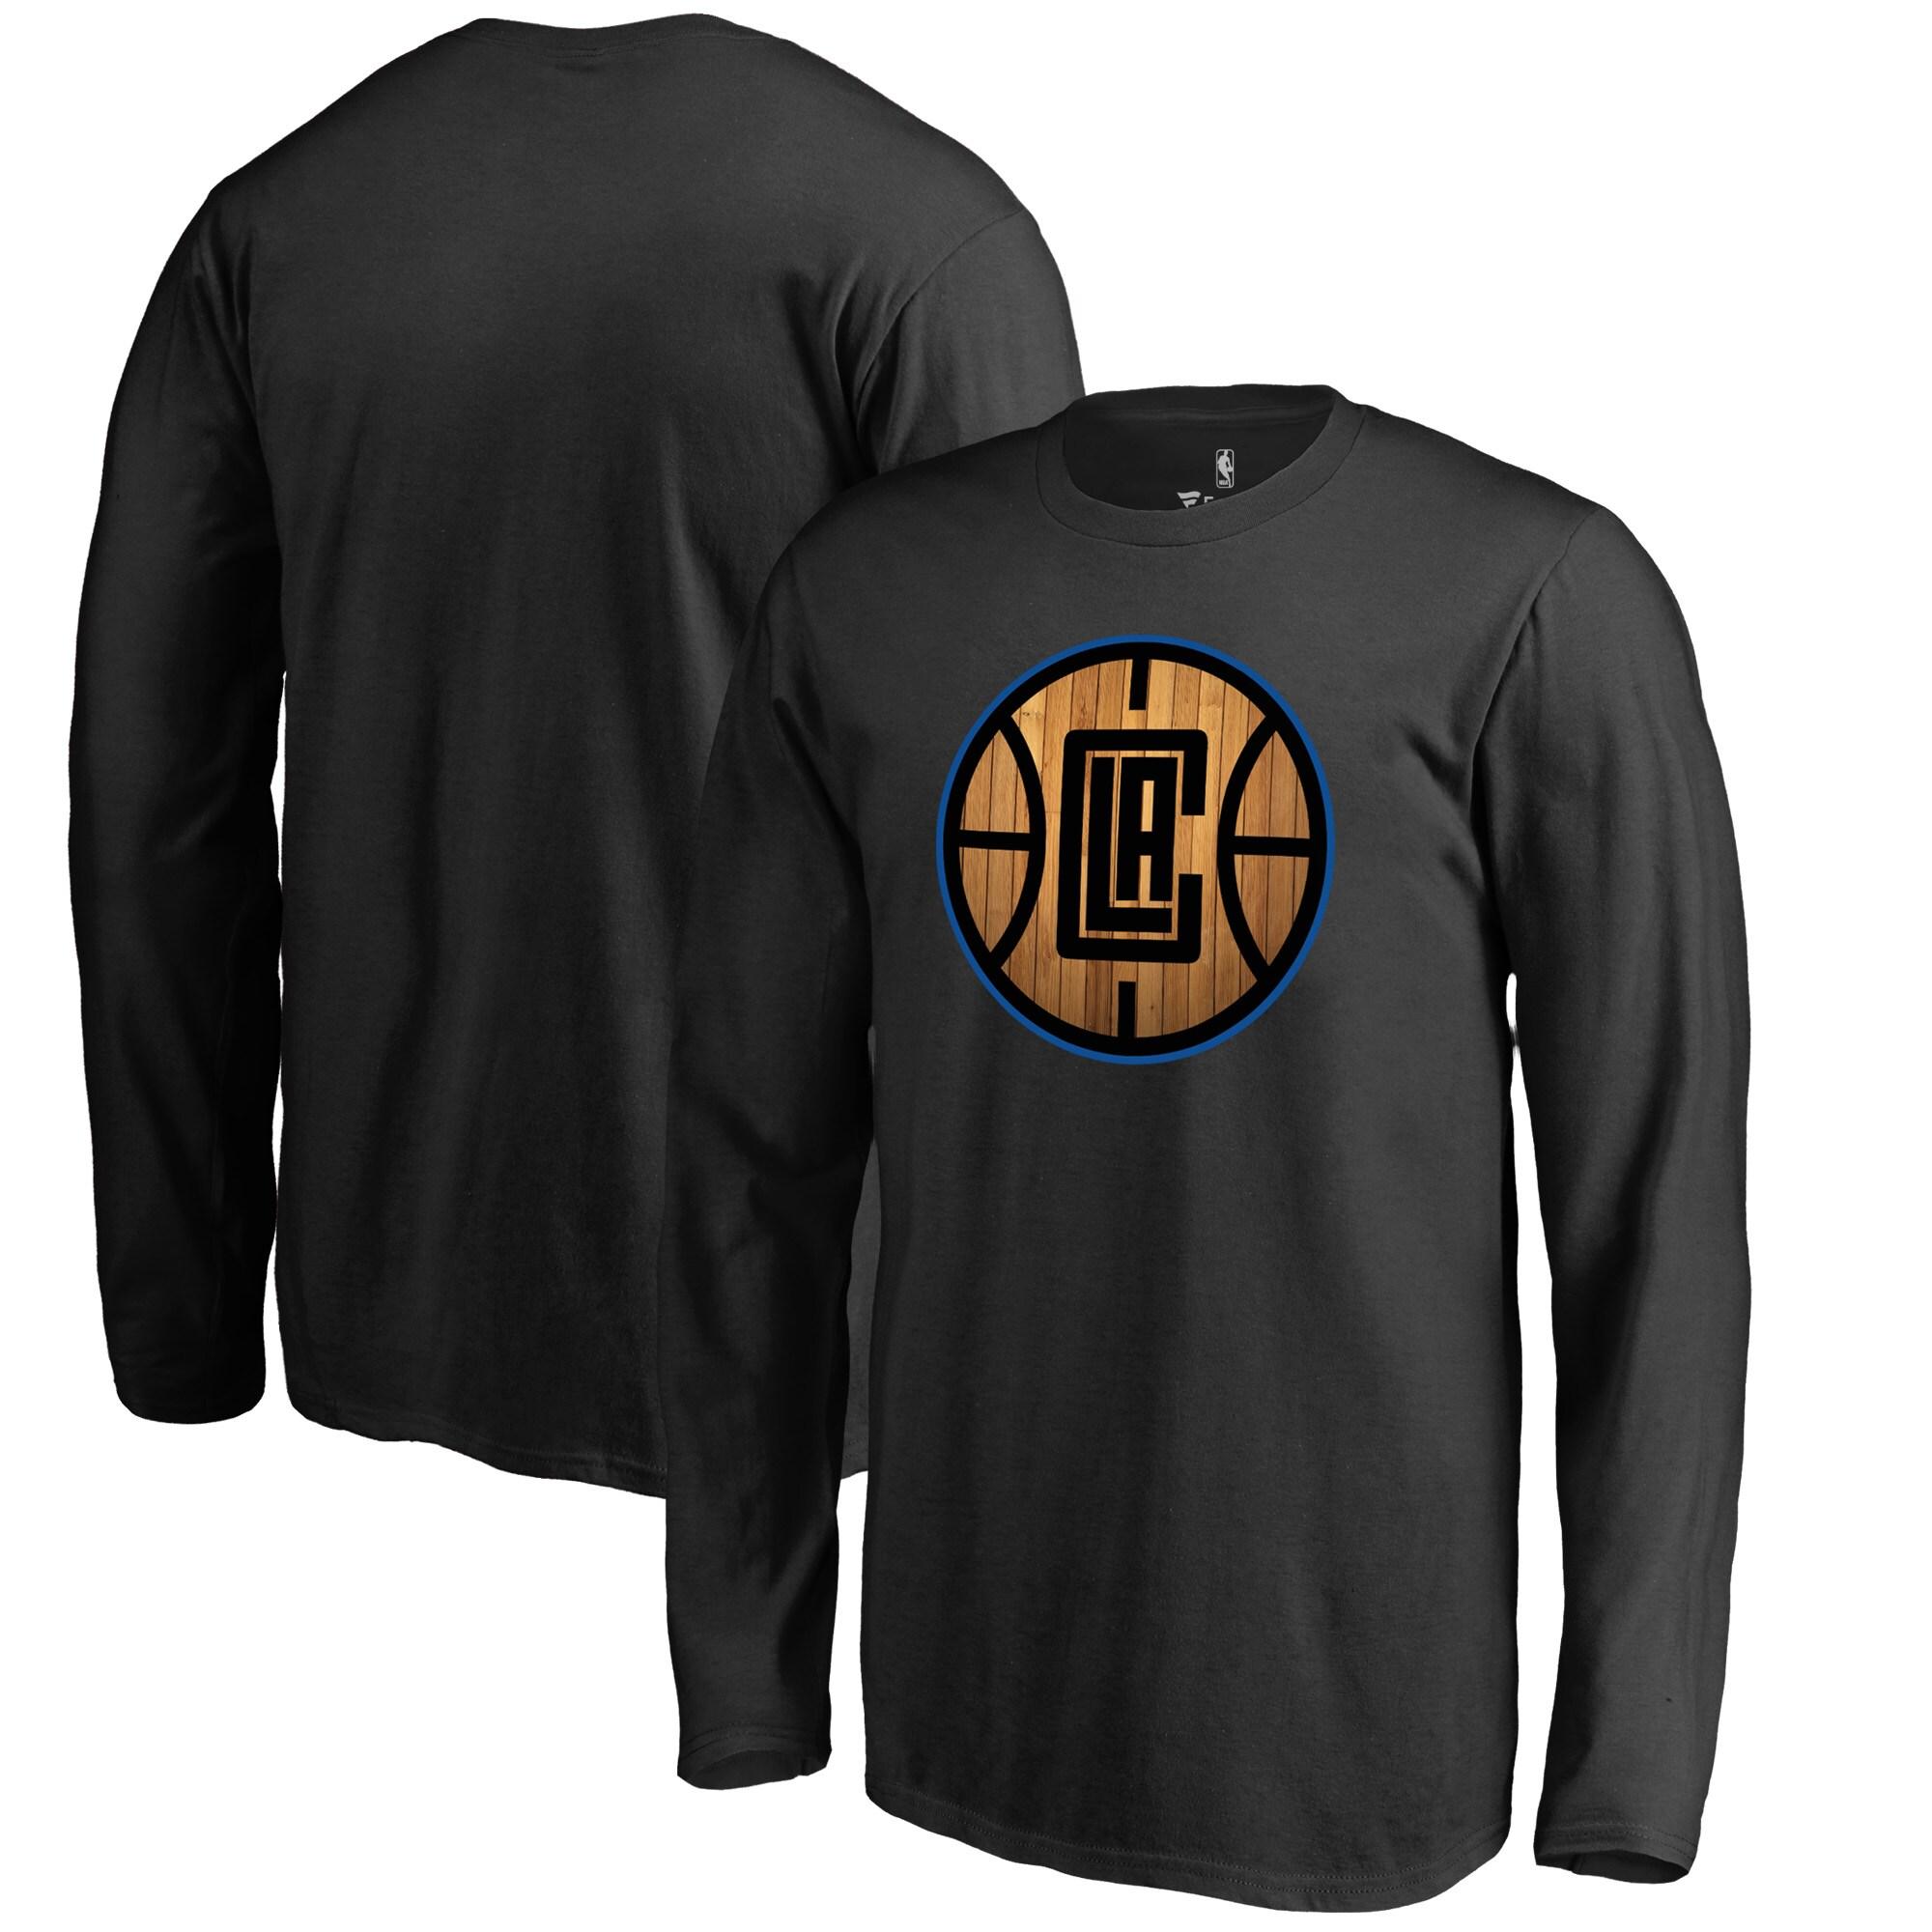 LA Clippers Fanatics Branded Youth Hardwood Long Sleeve T-Shirt - Black